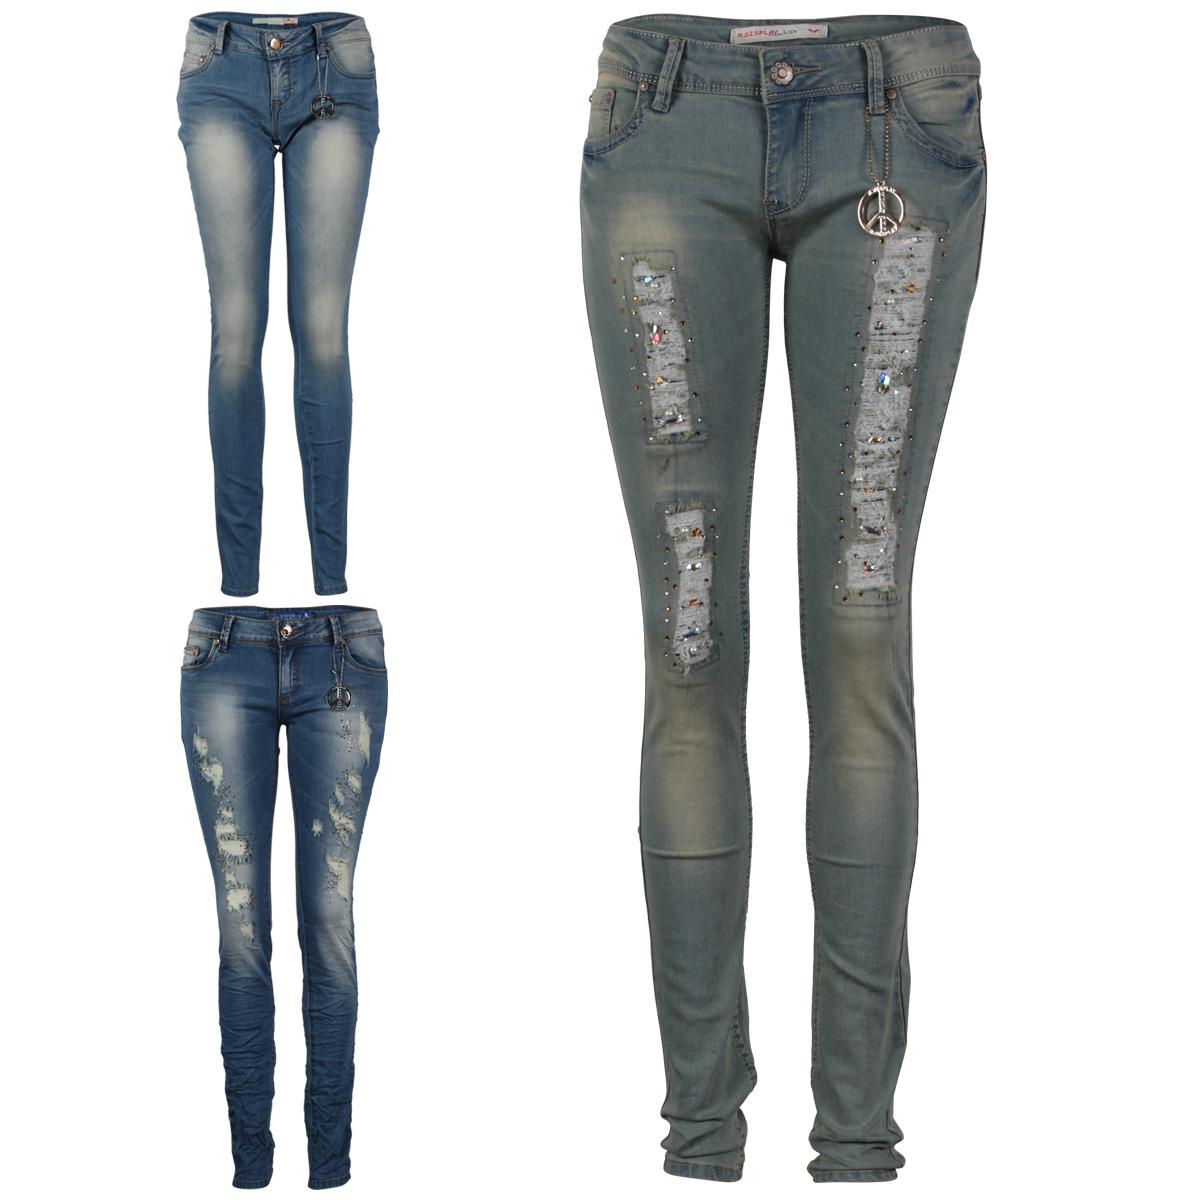 damen blaue frauen verzierte skinny enge zerrissene jeans hose gr 34 42 ebay. Black Bedroom Furniture Sets. Home Design Ideas